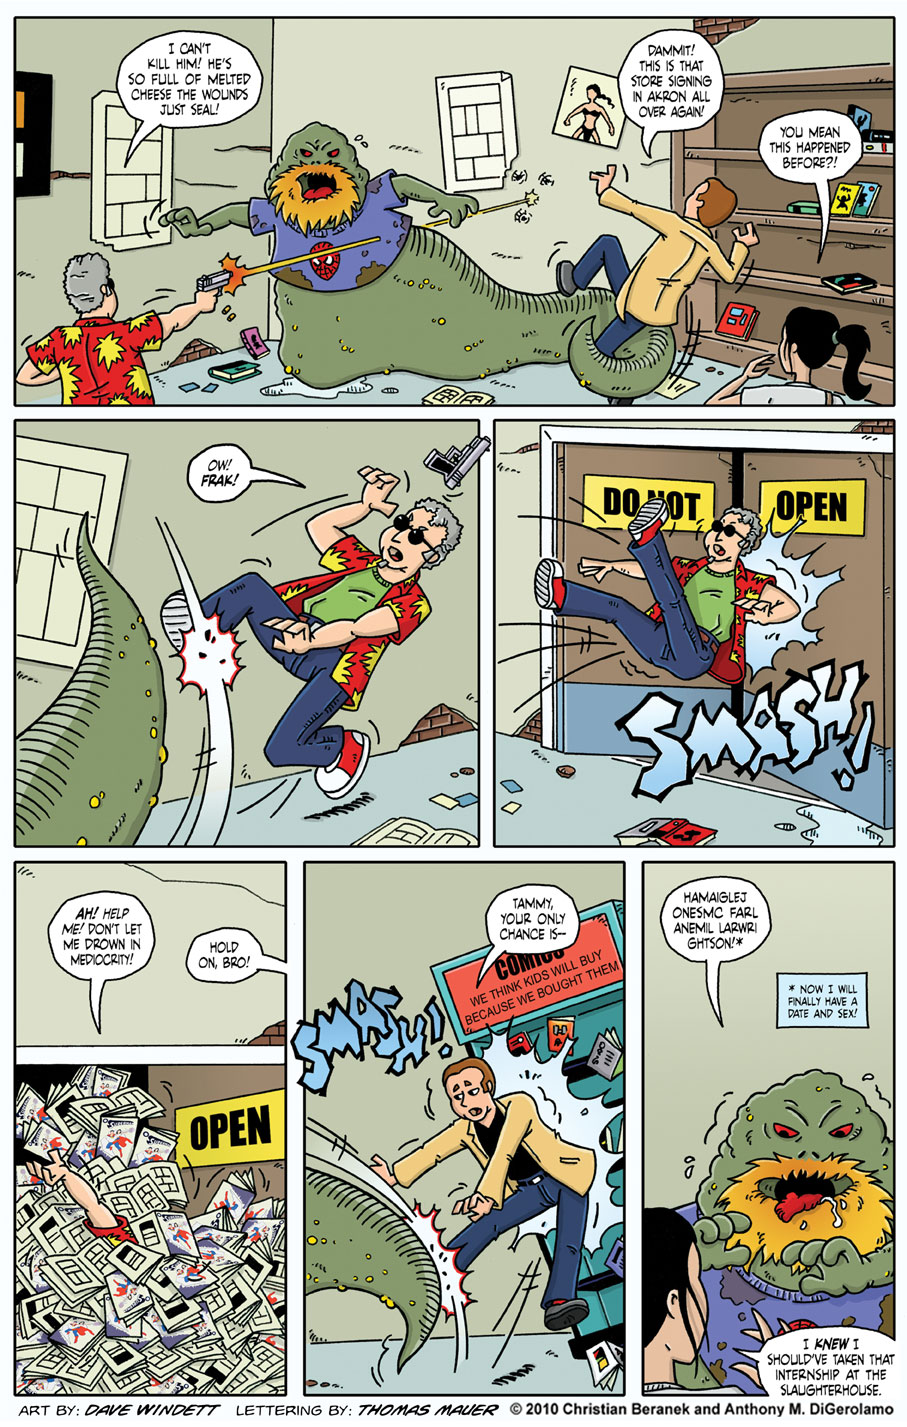 Comic Book Mafia #7: Fiend of the Mylar Bags